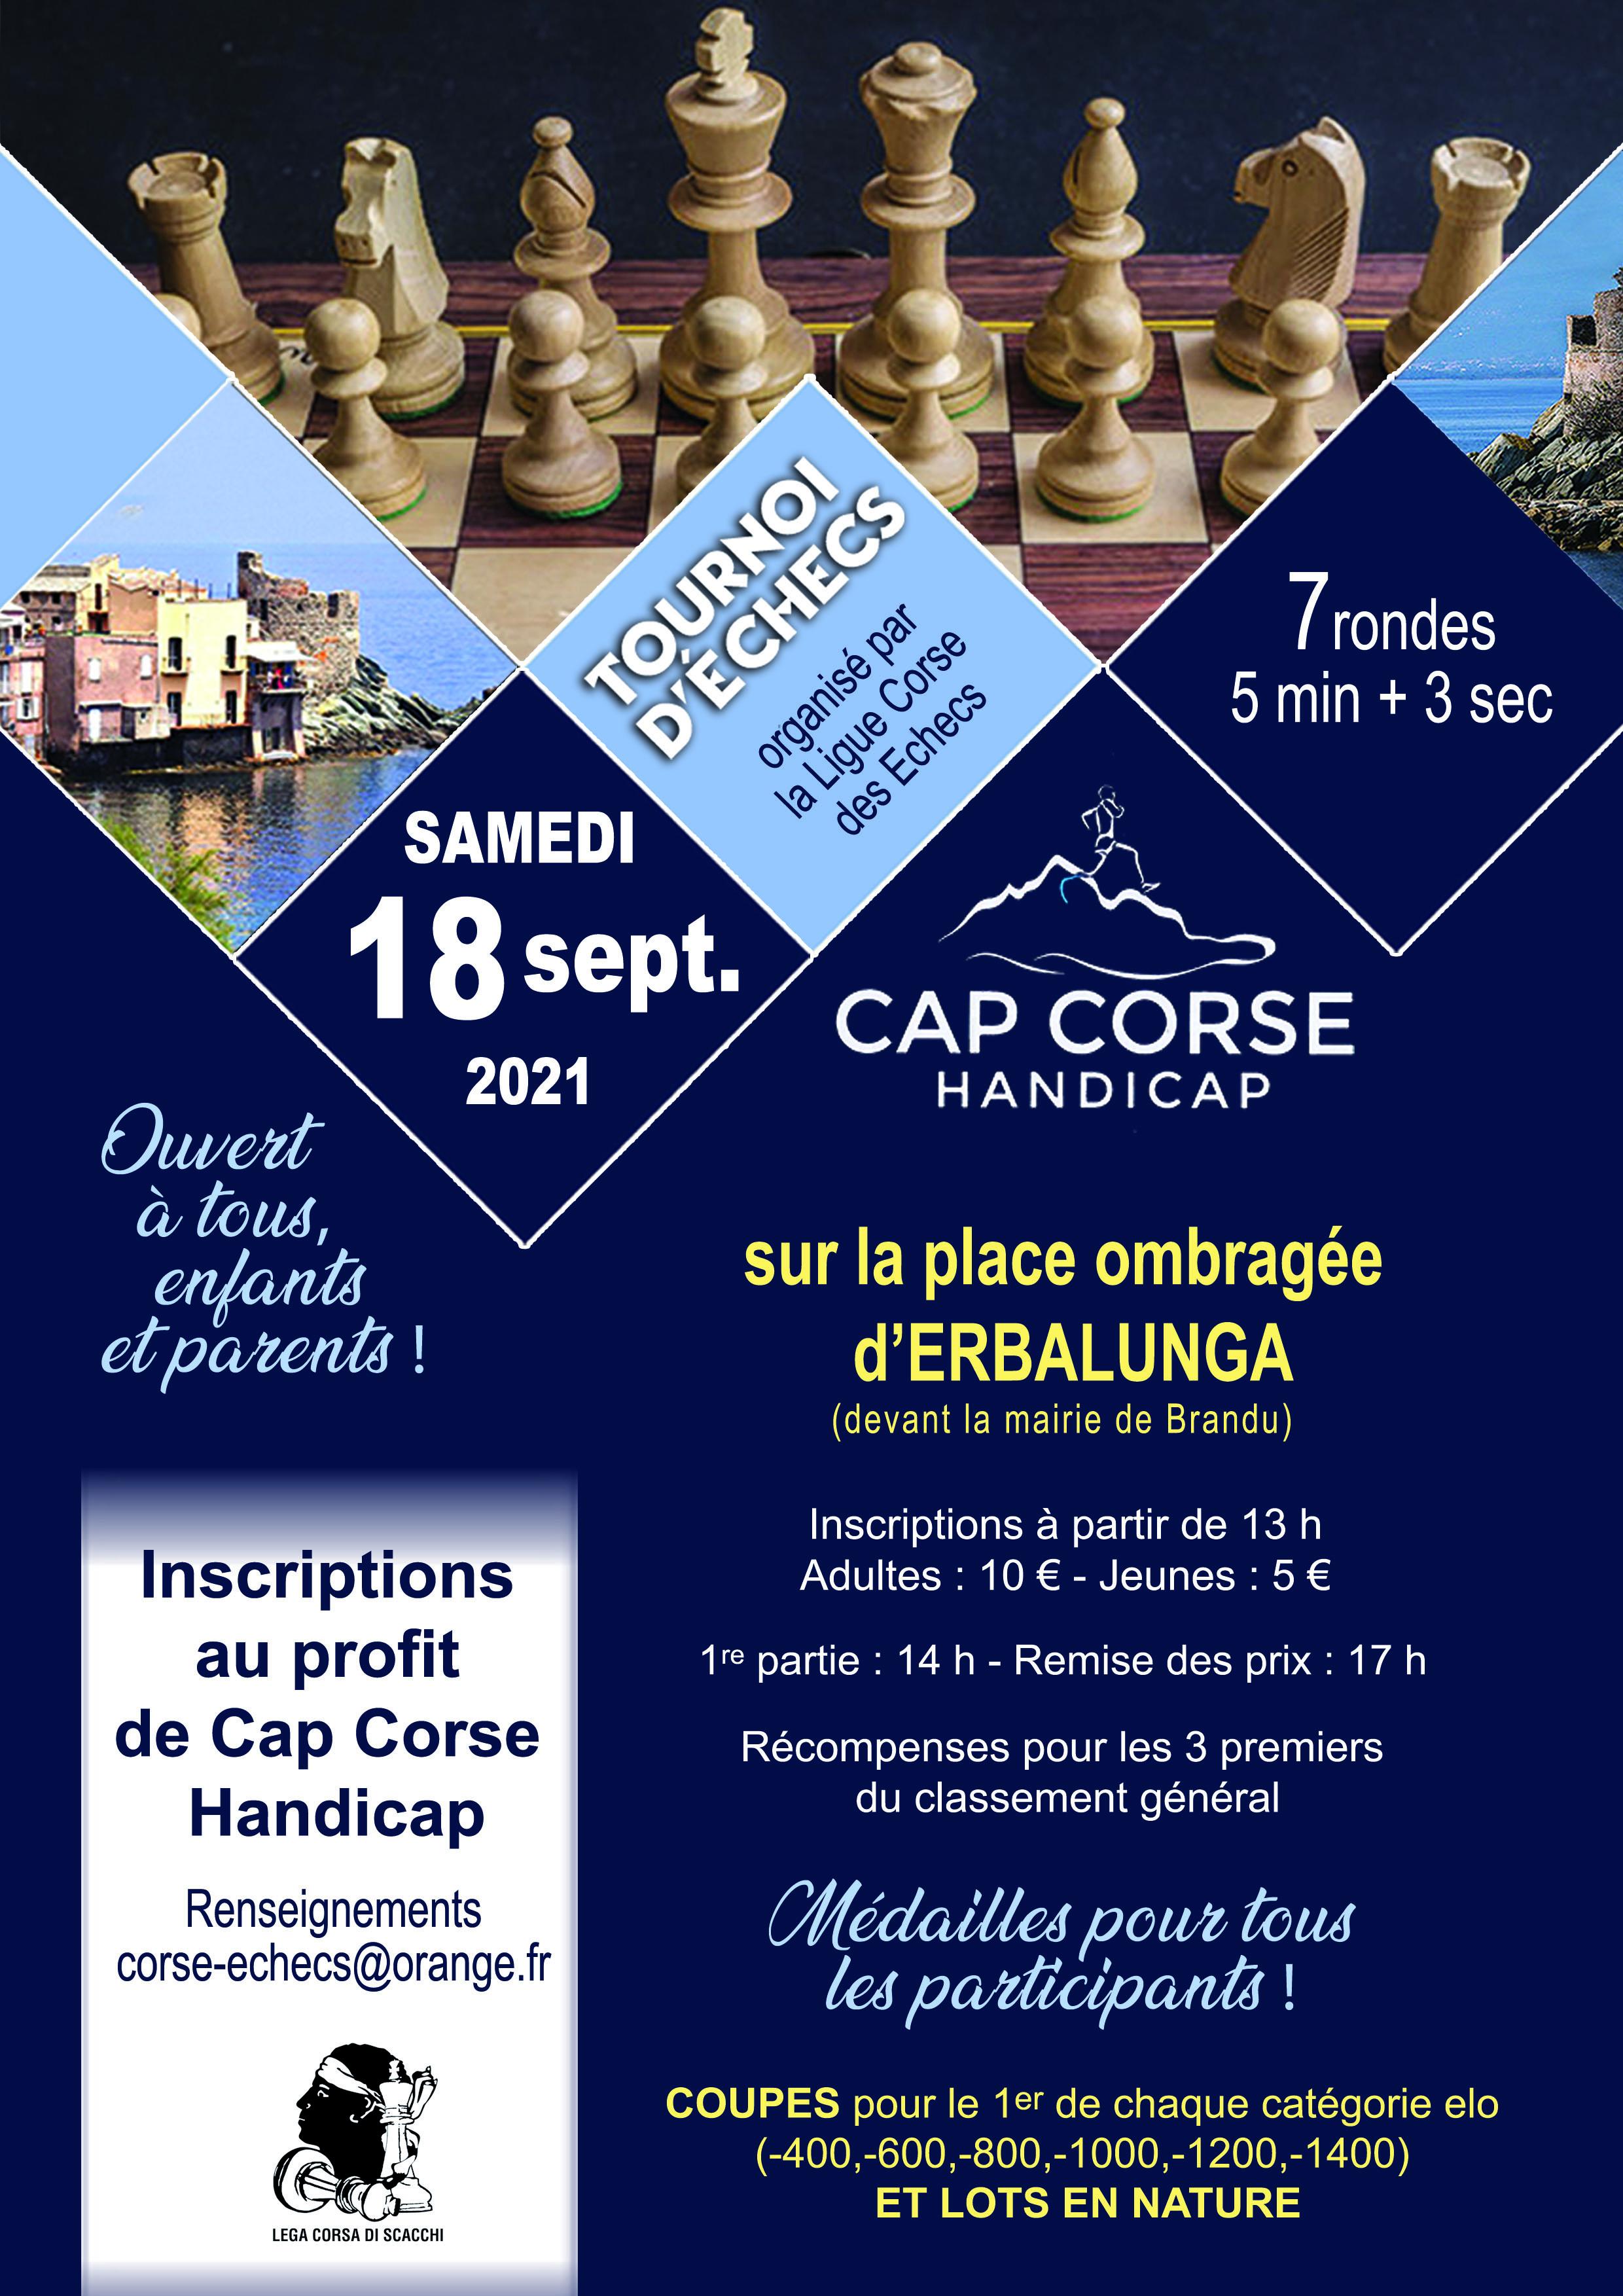 Open de blitz au profit de Cap Corse Handicap, samedi 18 septembre à Erbalonga